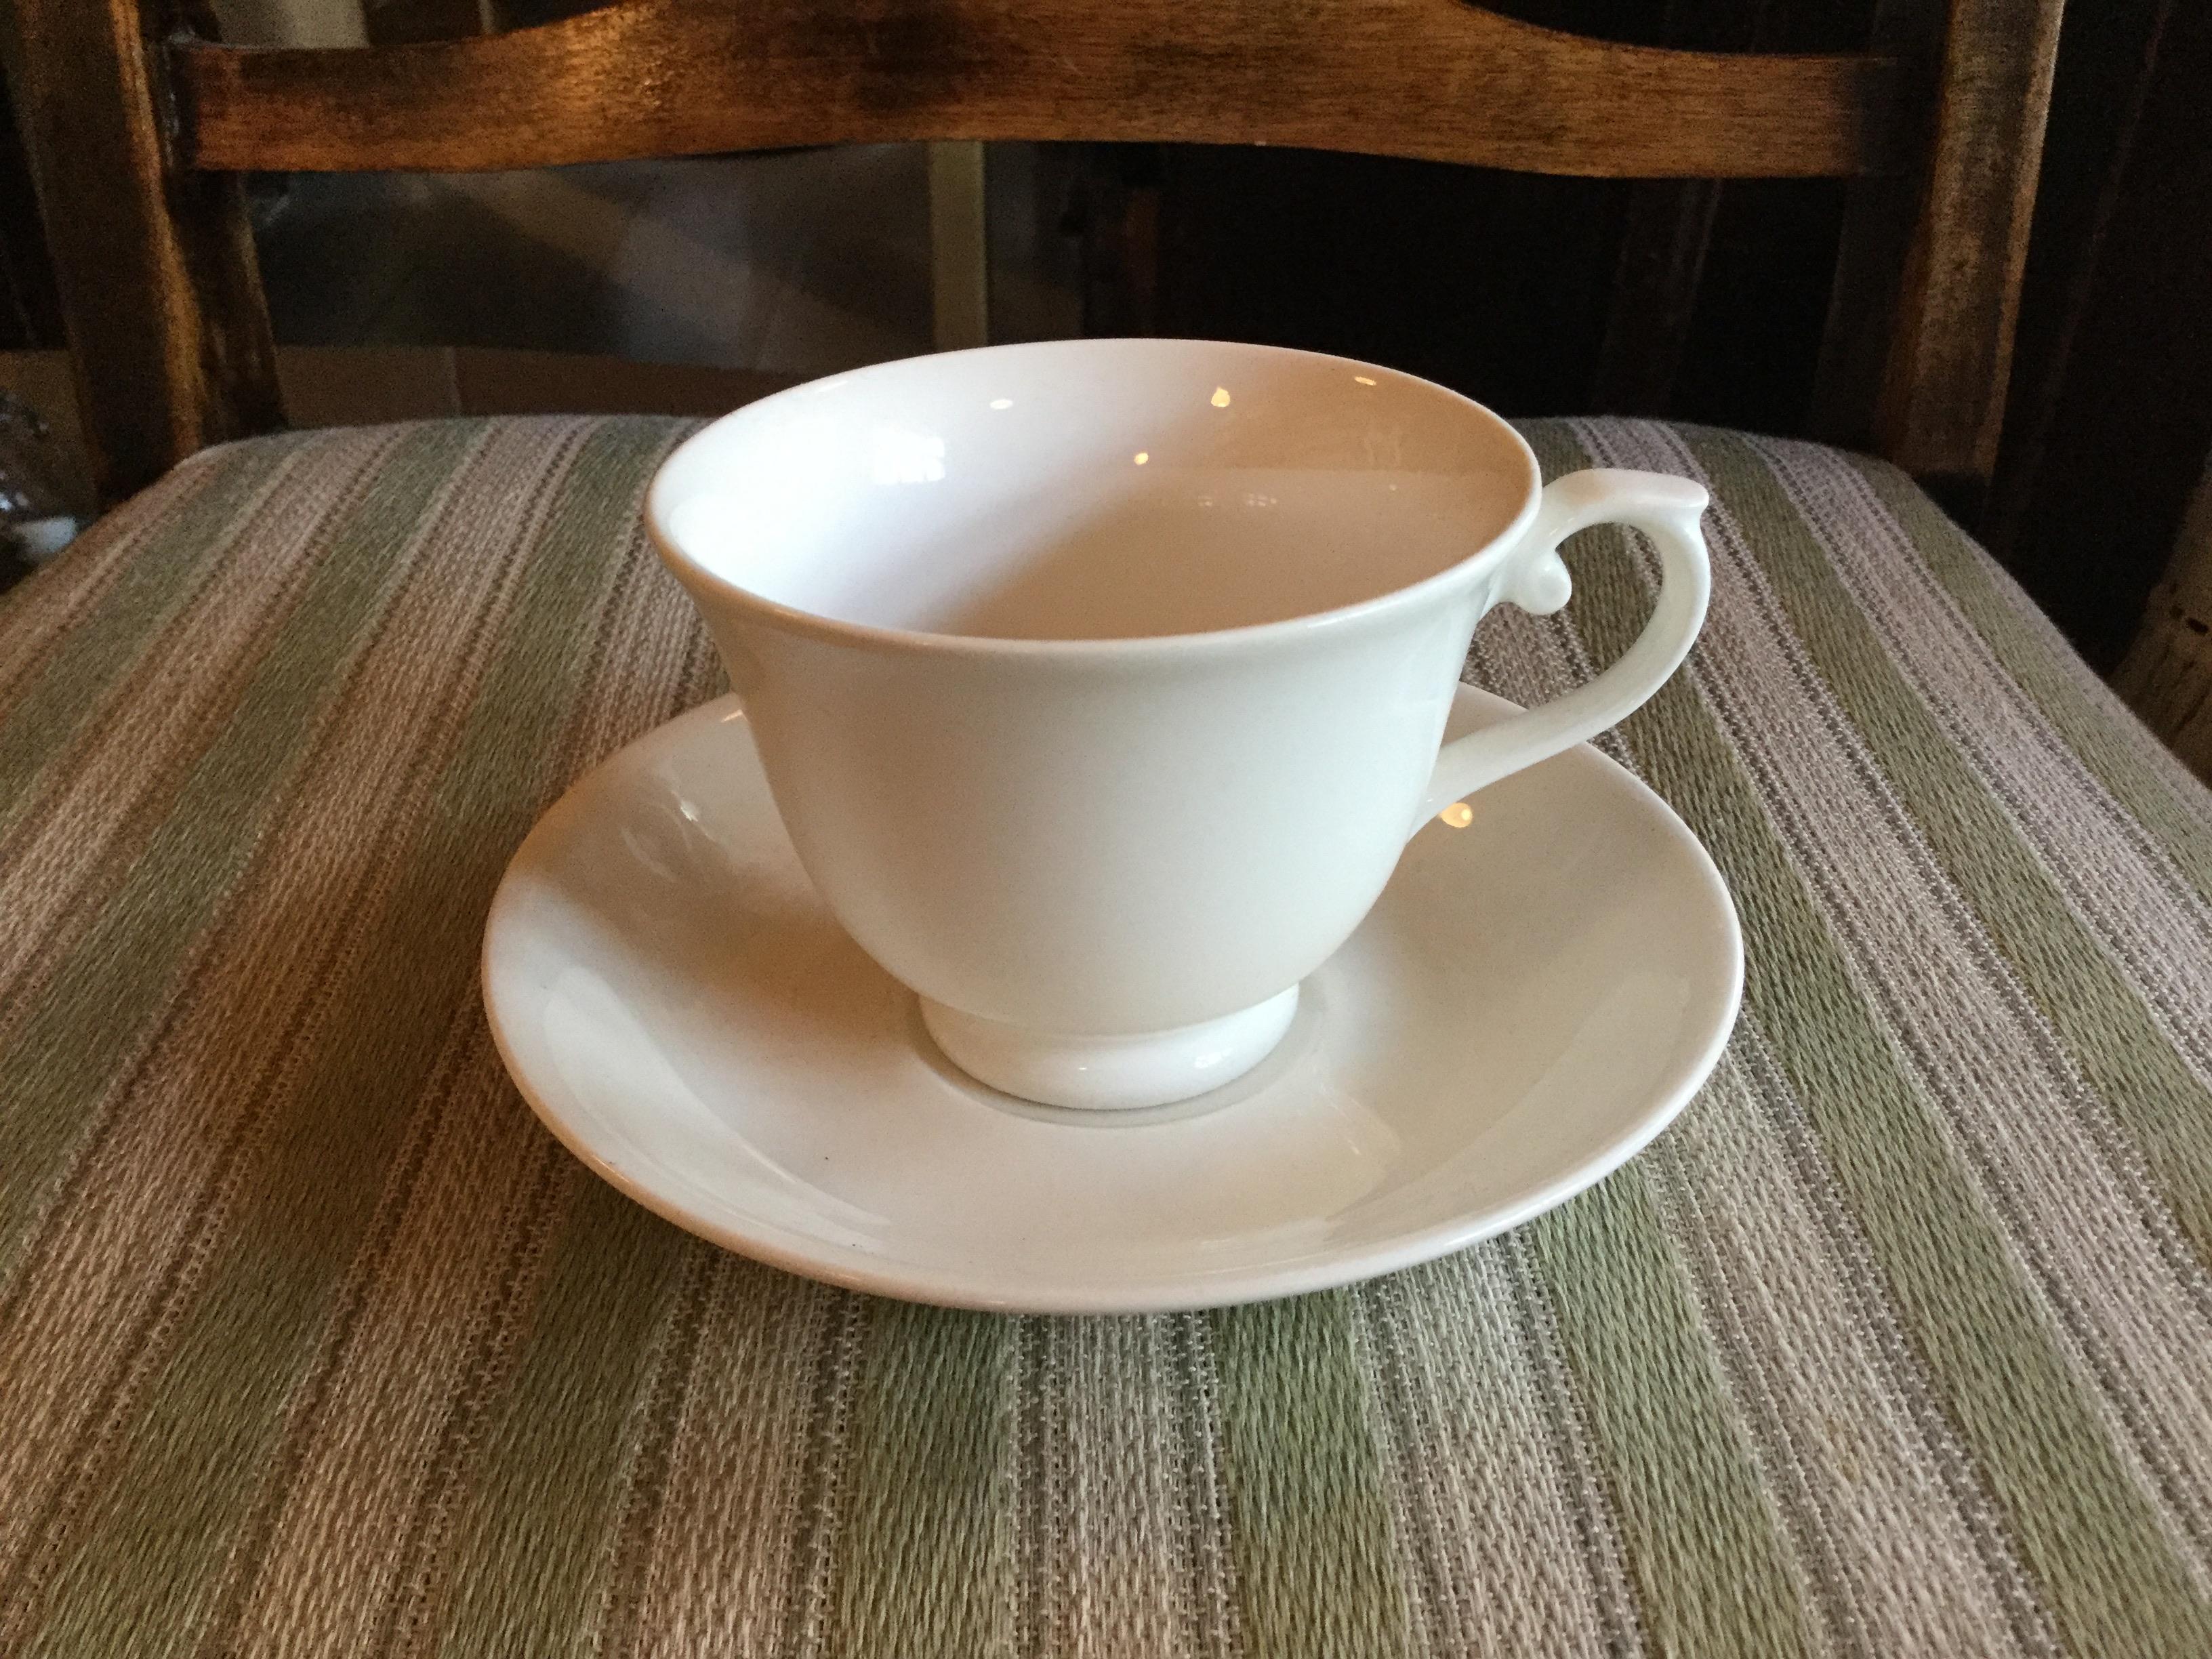 Arabia kahvikuppipari valkoinen, malli AX.